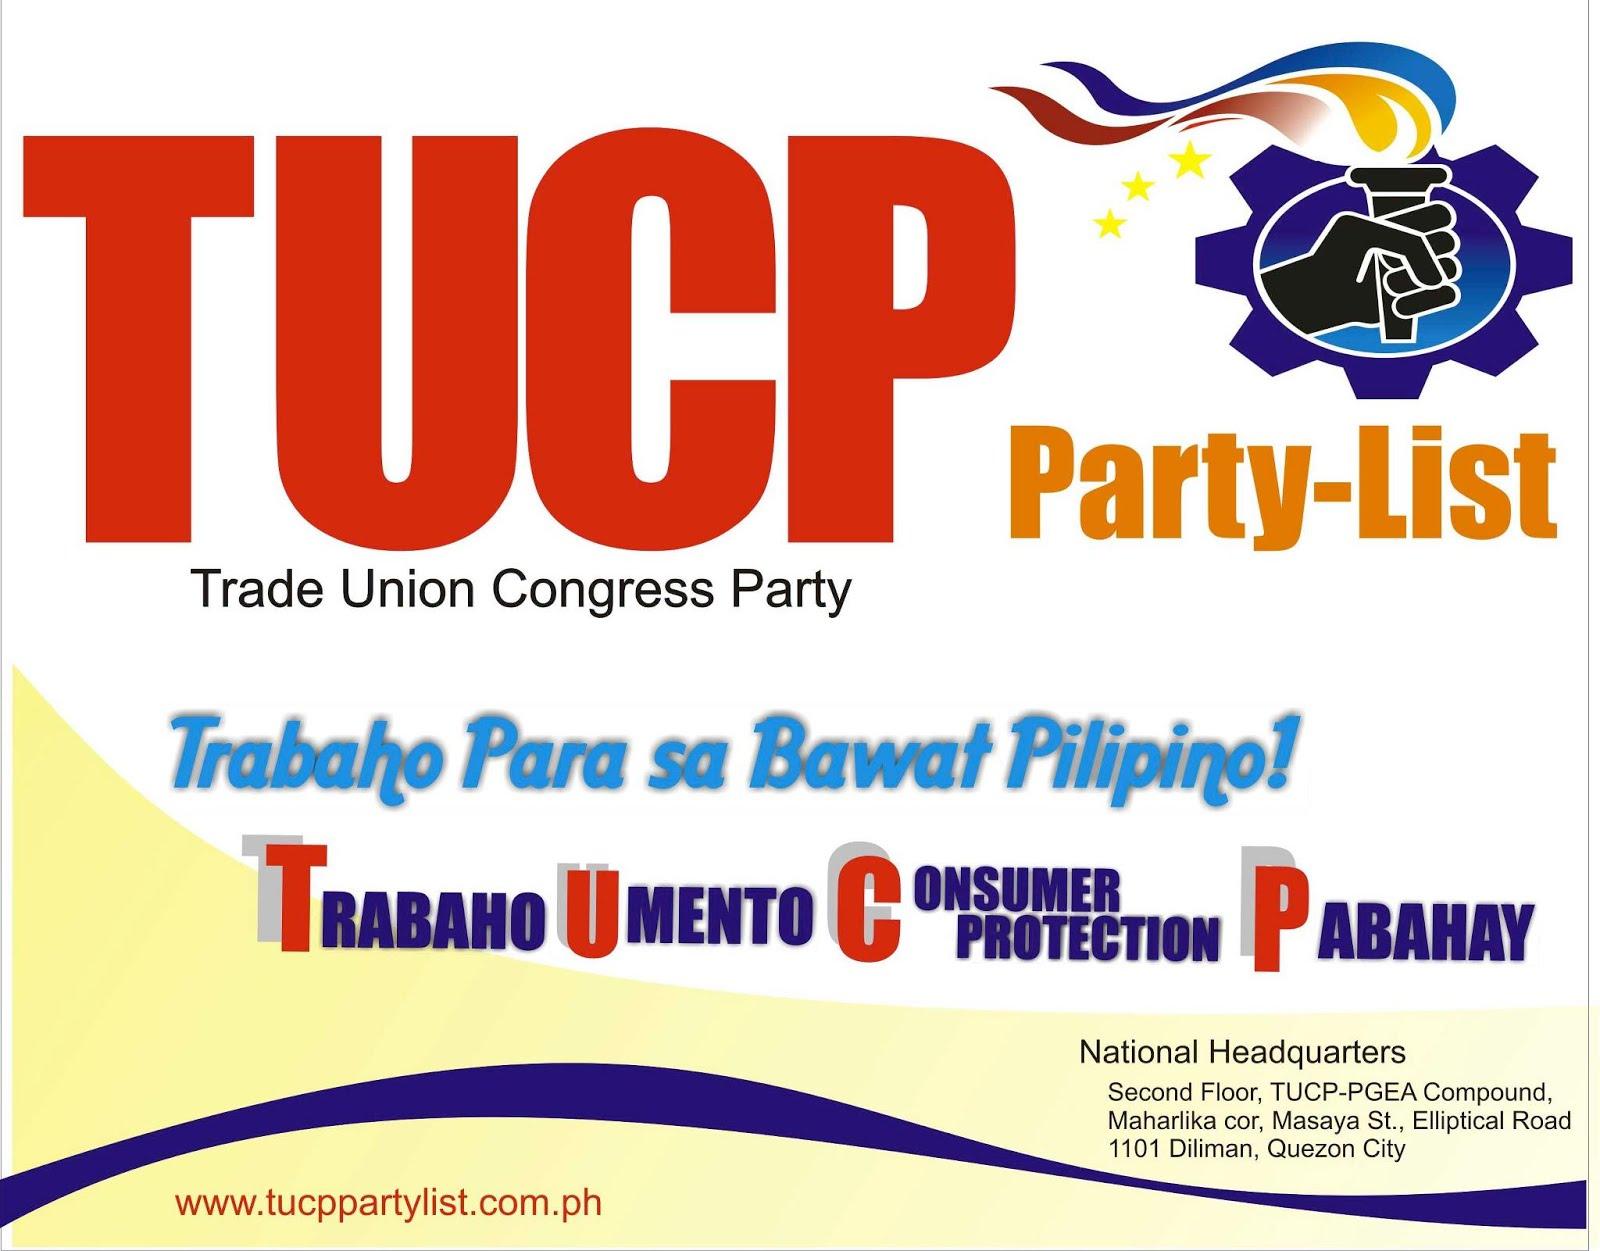 TUCP Party-list